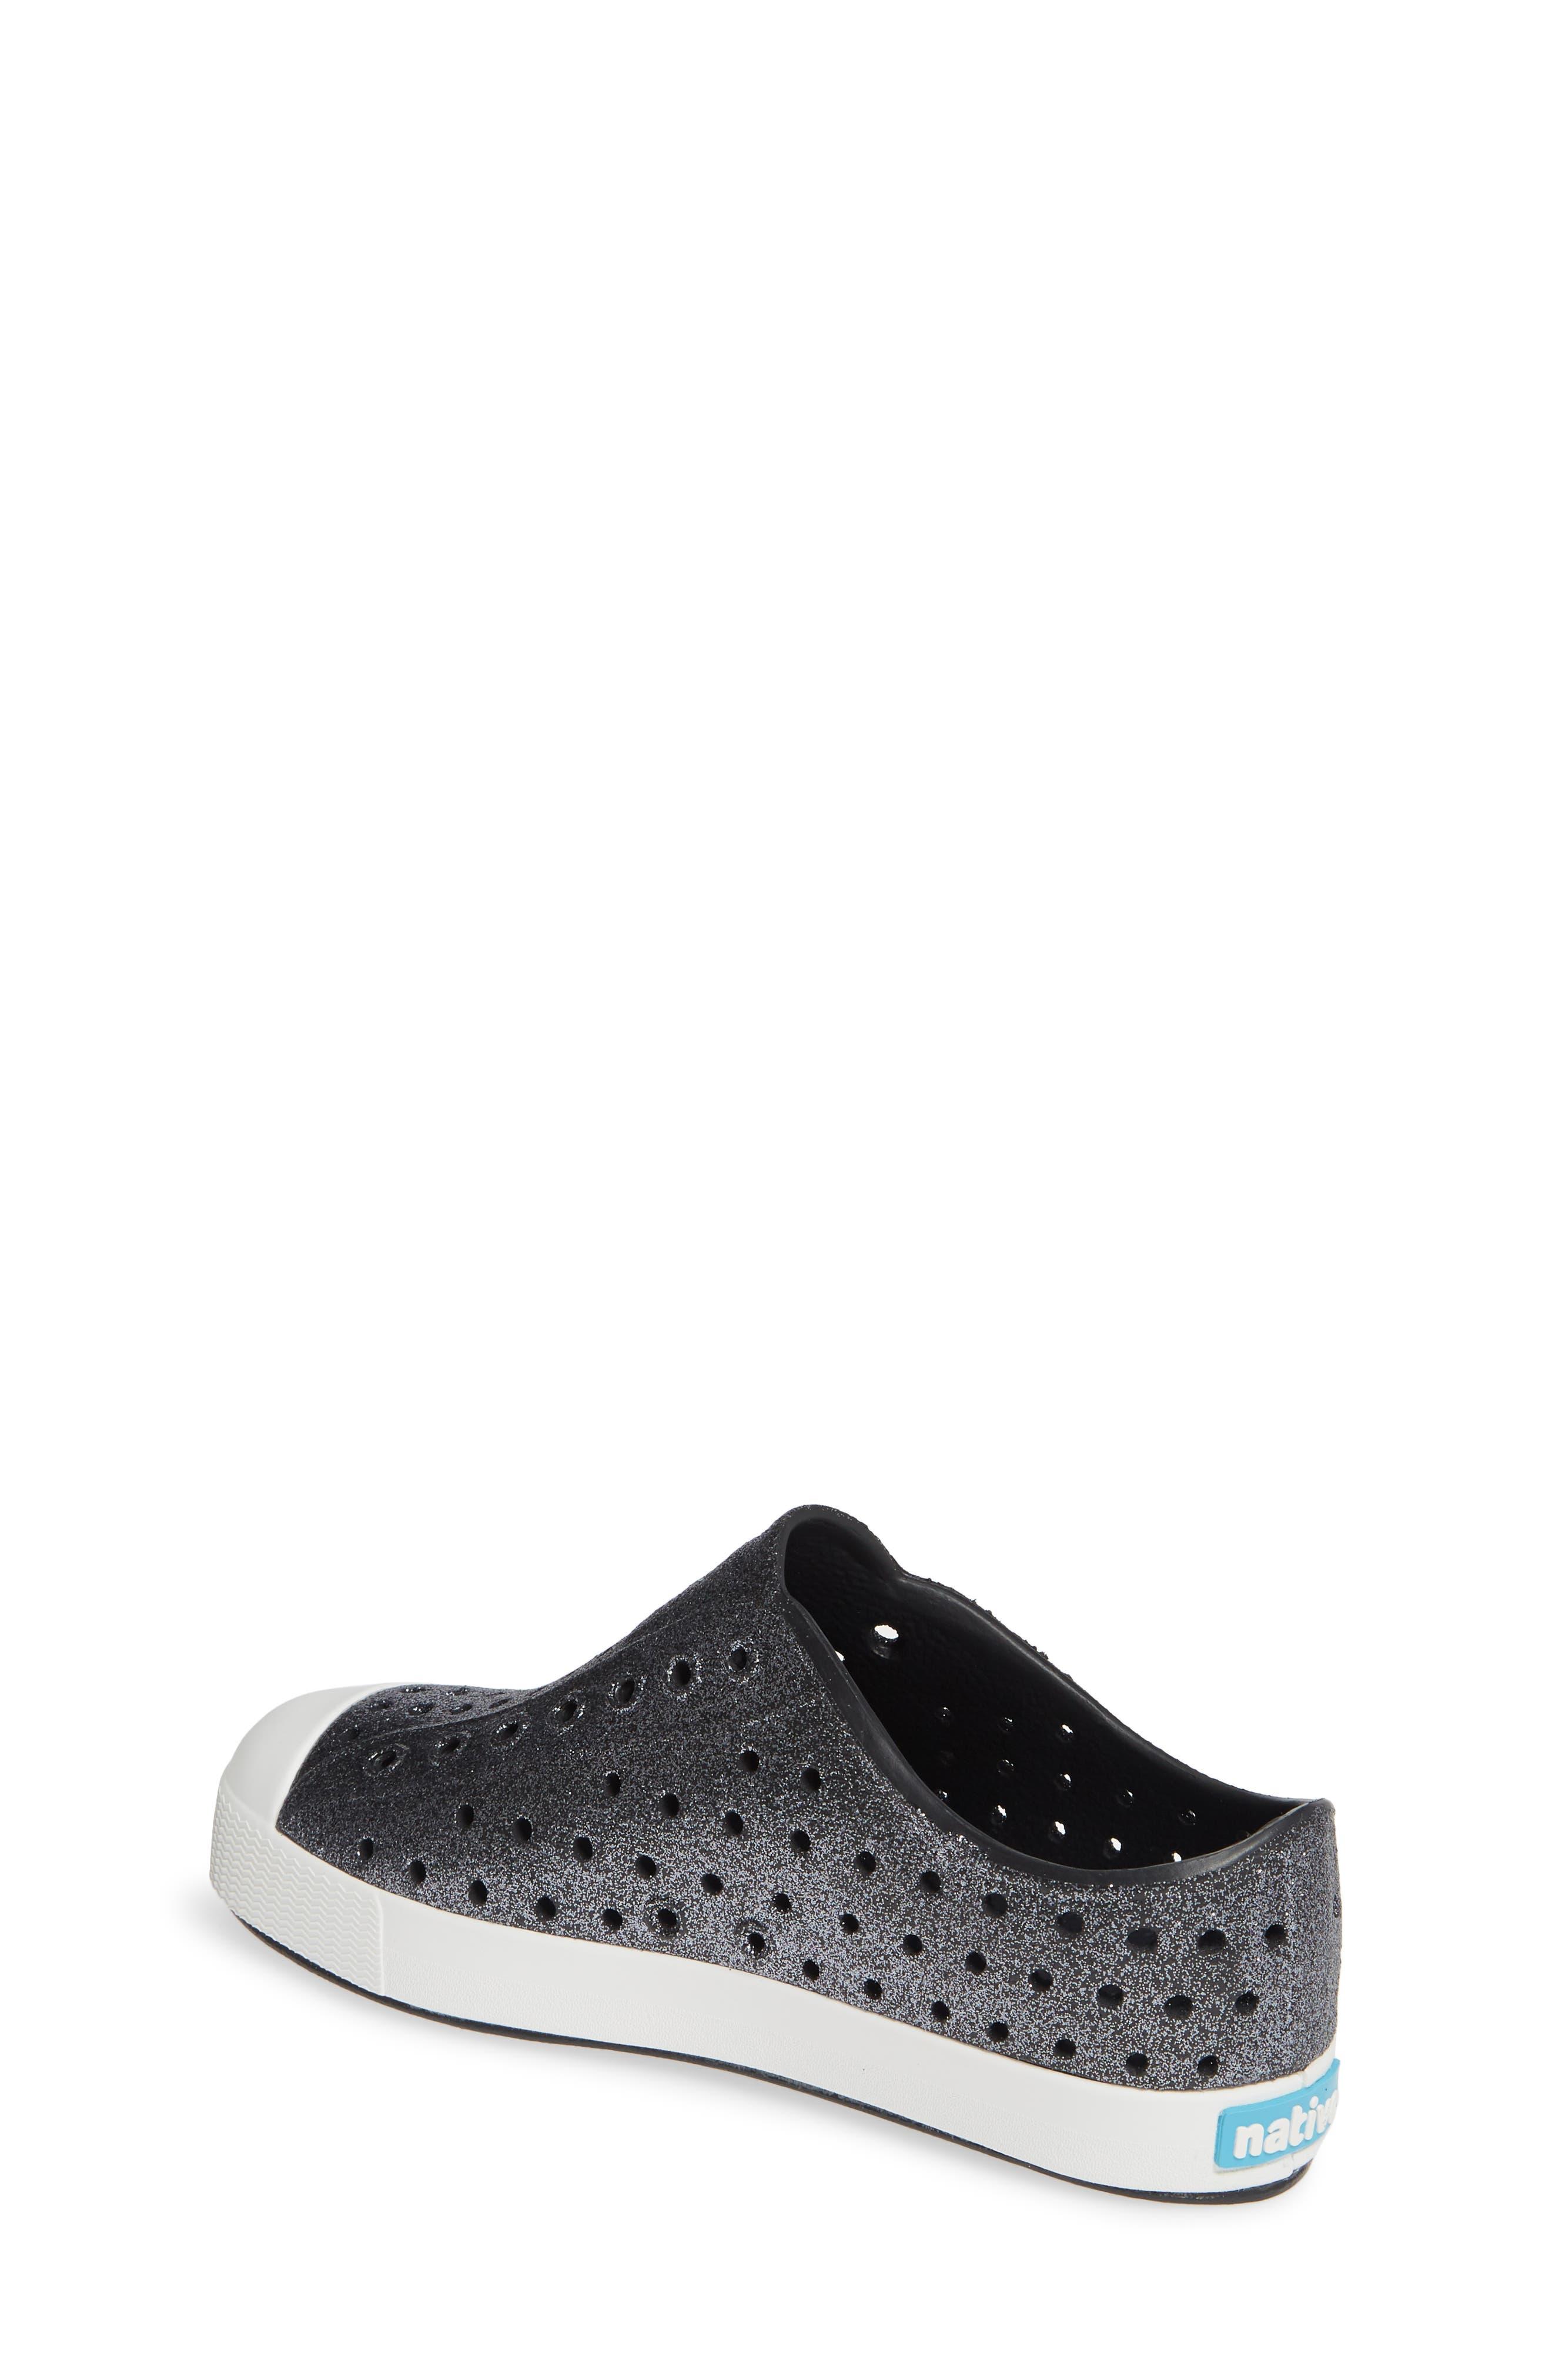 04d022b9f4b52 Baby, Walker & Toddler Shoes | Nordstrom